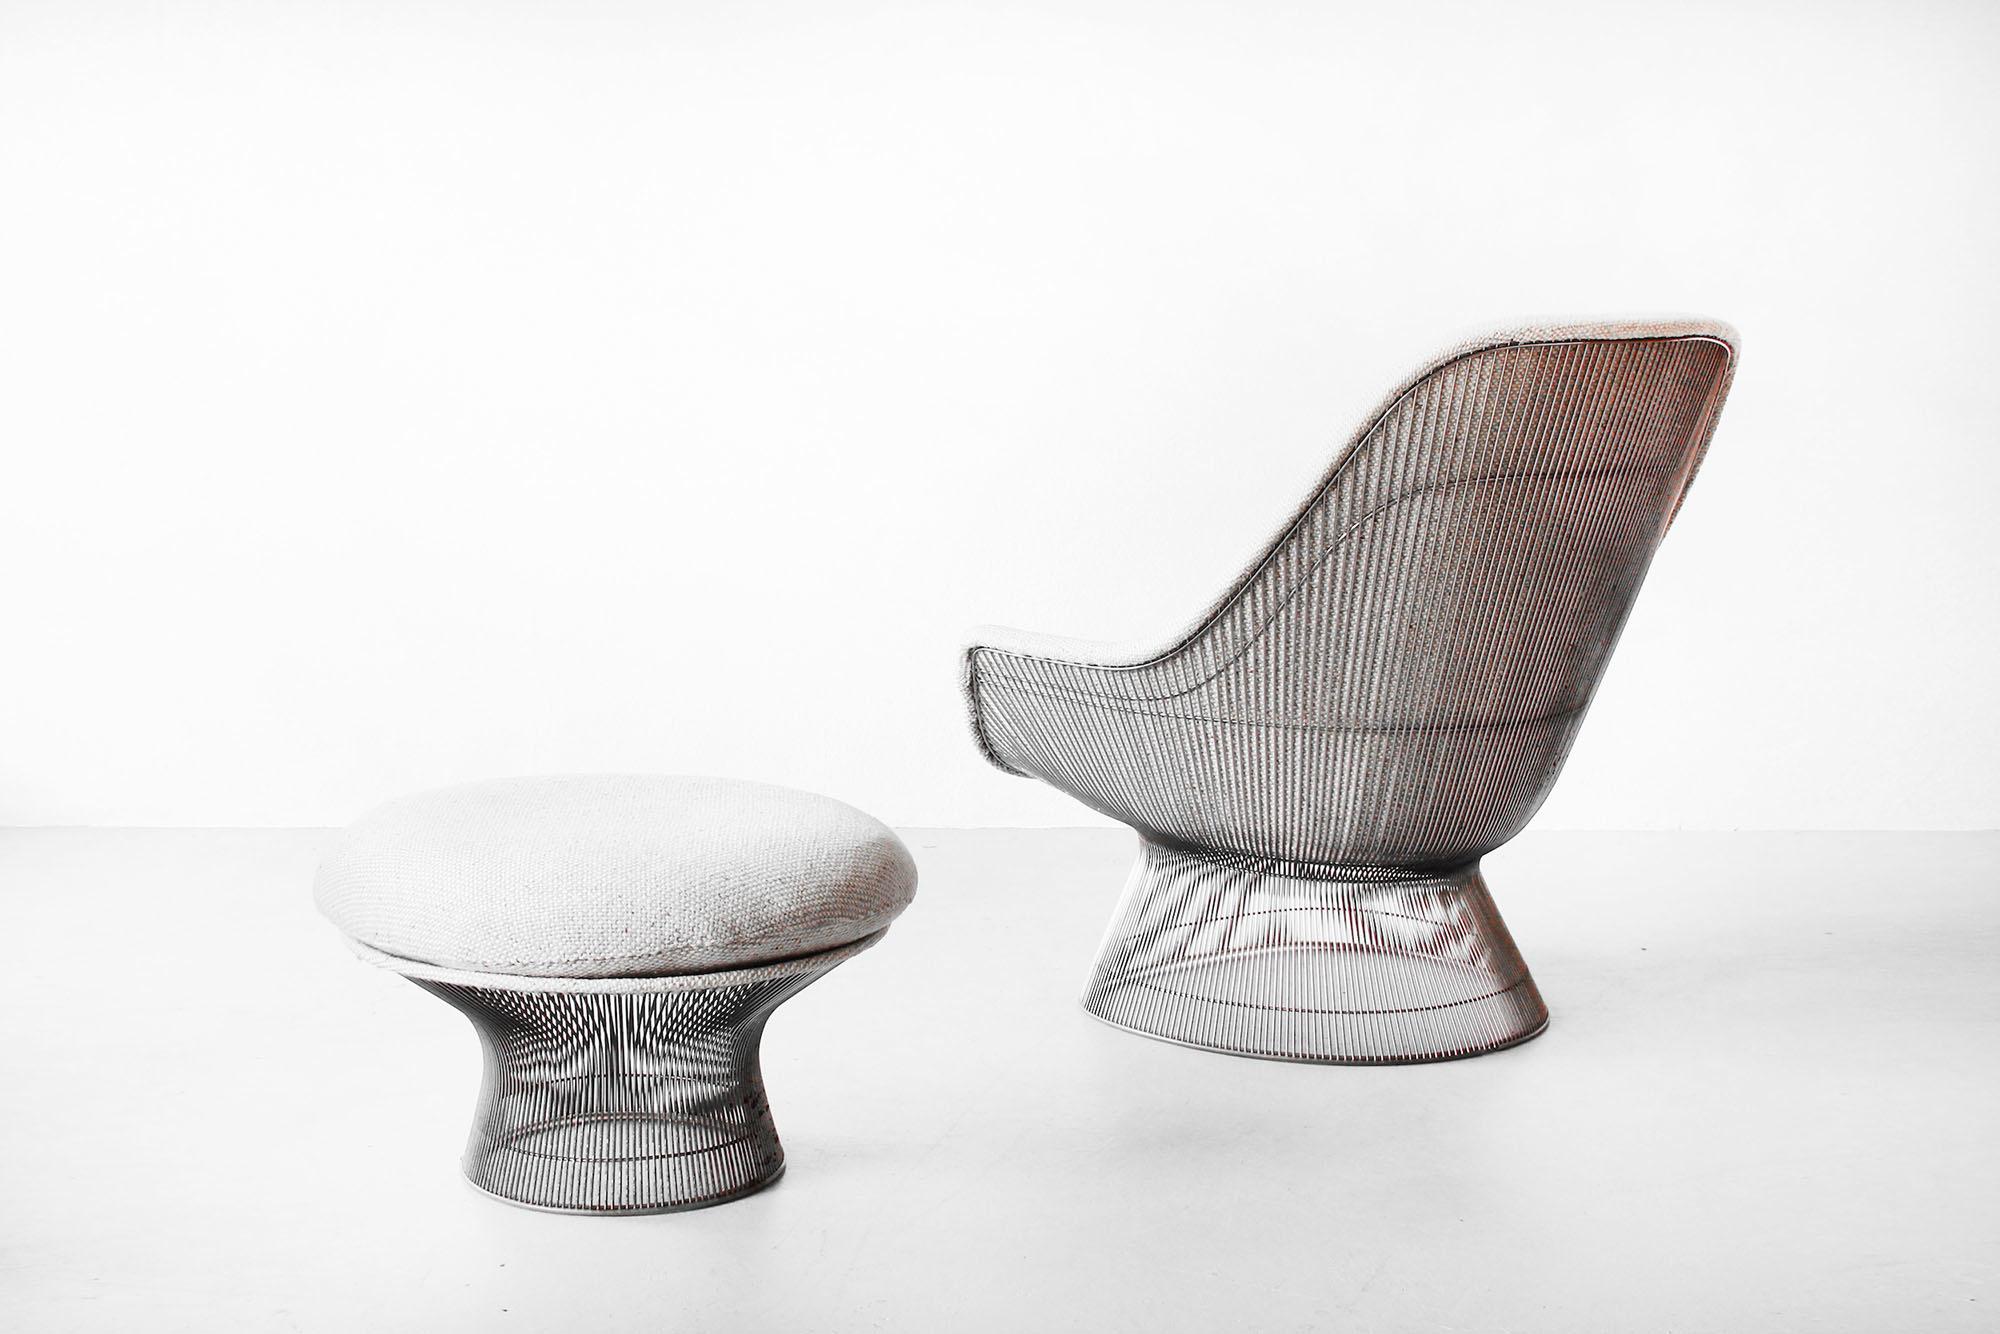 Galerie Bachmann • Lounge Chair & Hocker by Warren Platner for